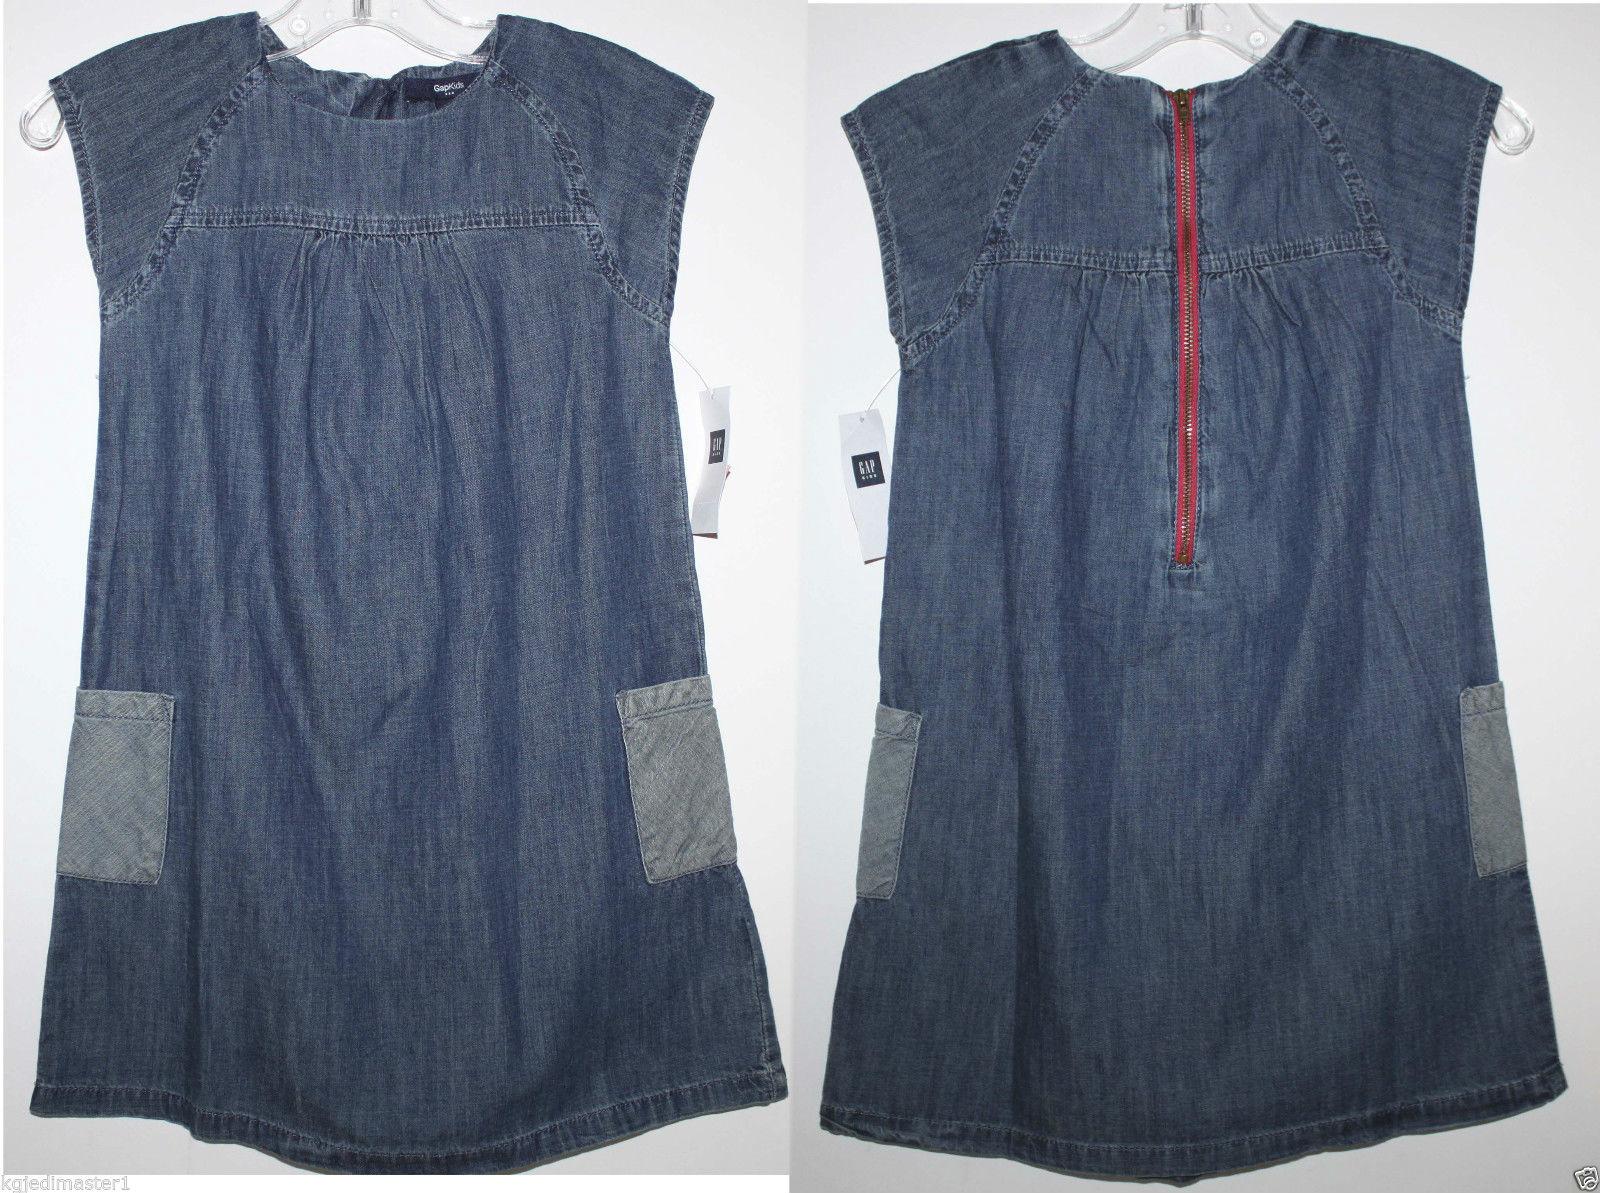 4da495e6fcd Gap Kids NWT Girl's XS 4 5 Blue Chambray and 10 similar items. S l1600